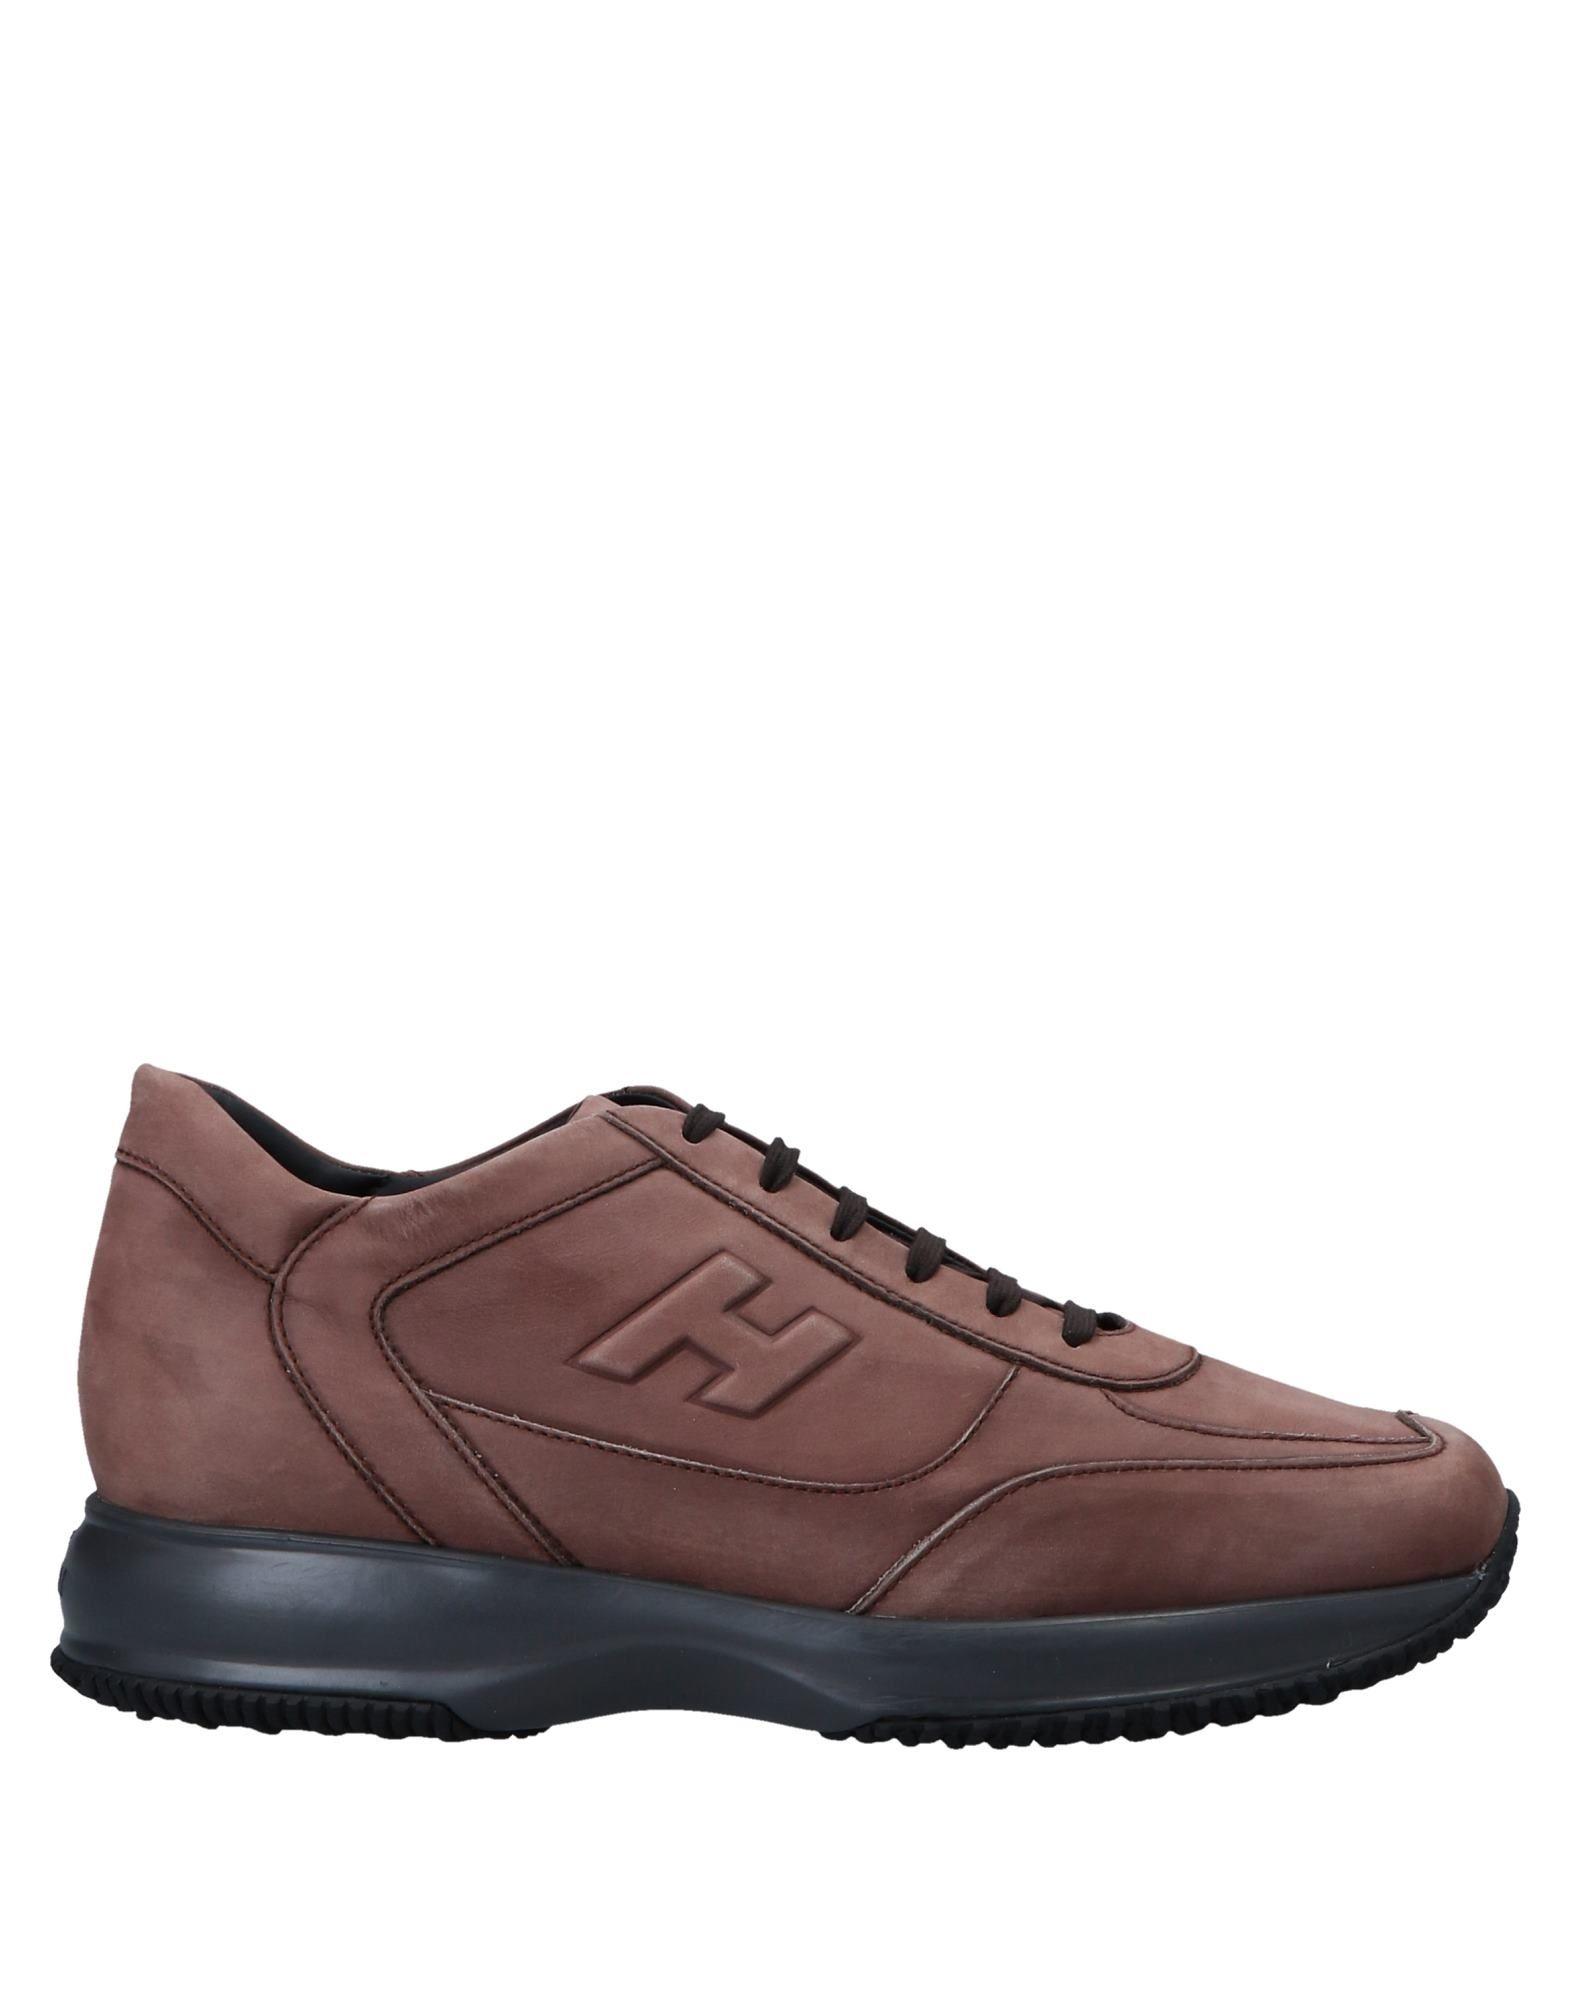 Hogan Sneakers Herren  11316485VI Gute Qualität beliebte Schuhe